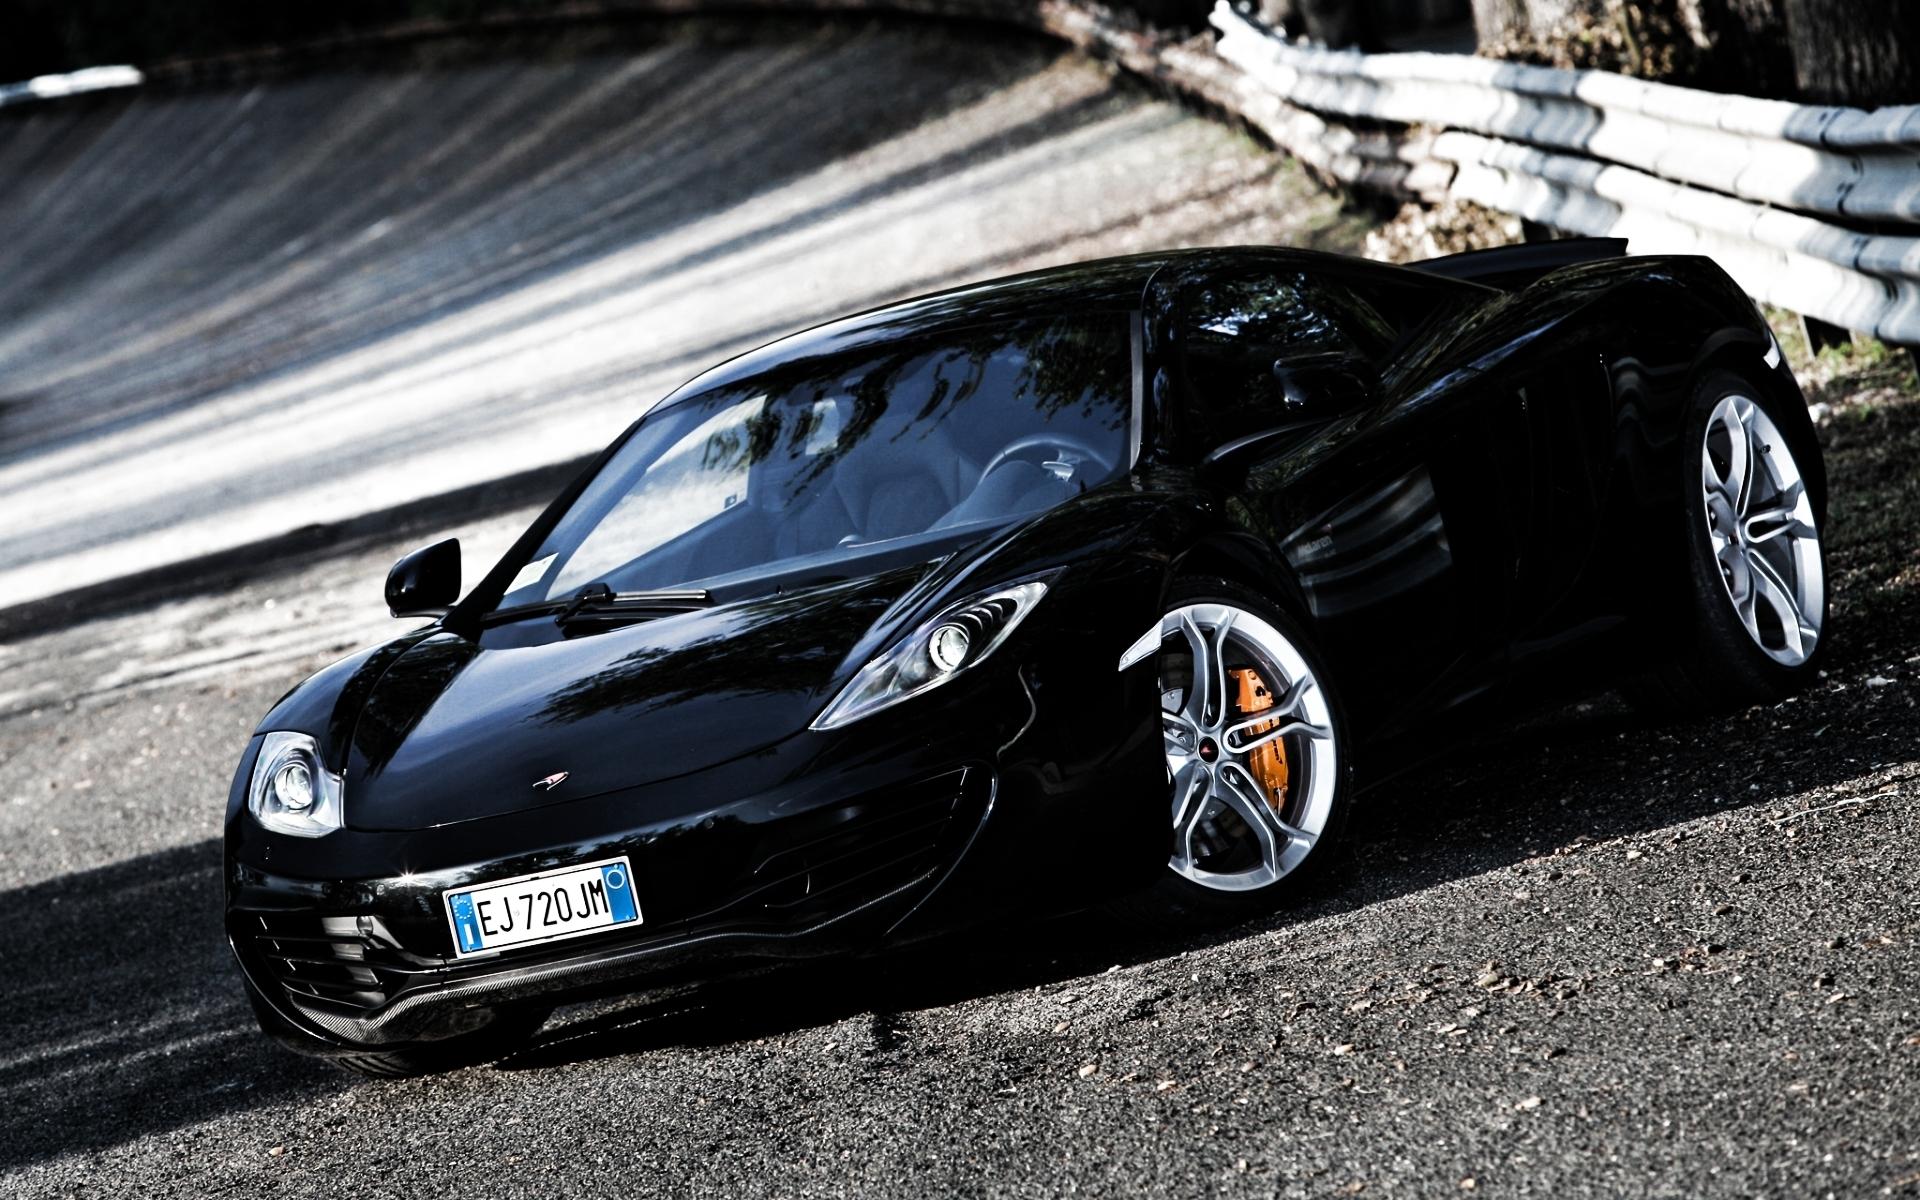 Black Car Car Mclaren Mclaren 12c Mclaren Mp4 12c Supercar Vehicle Wallpaper Resolution 1920x1200 Id 893385 Wallha Com